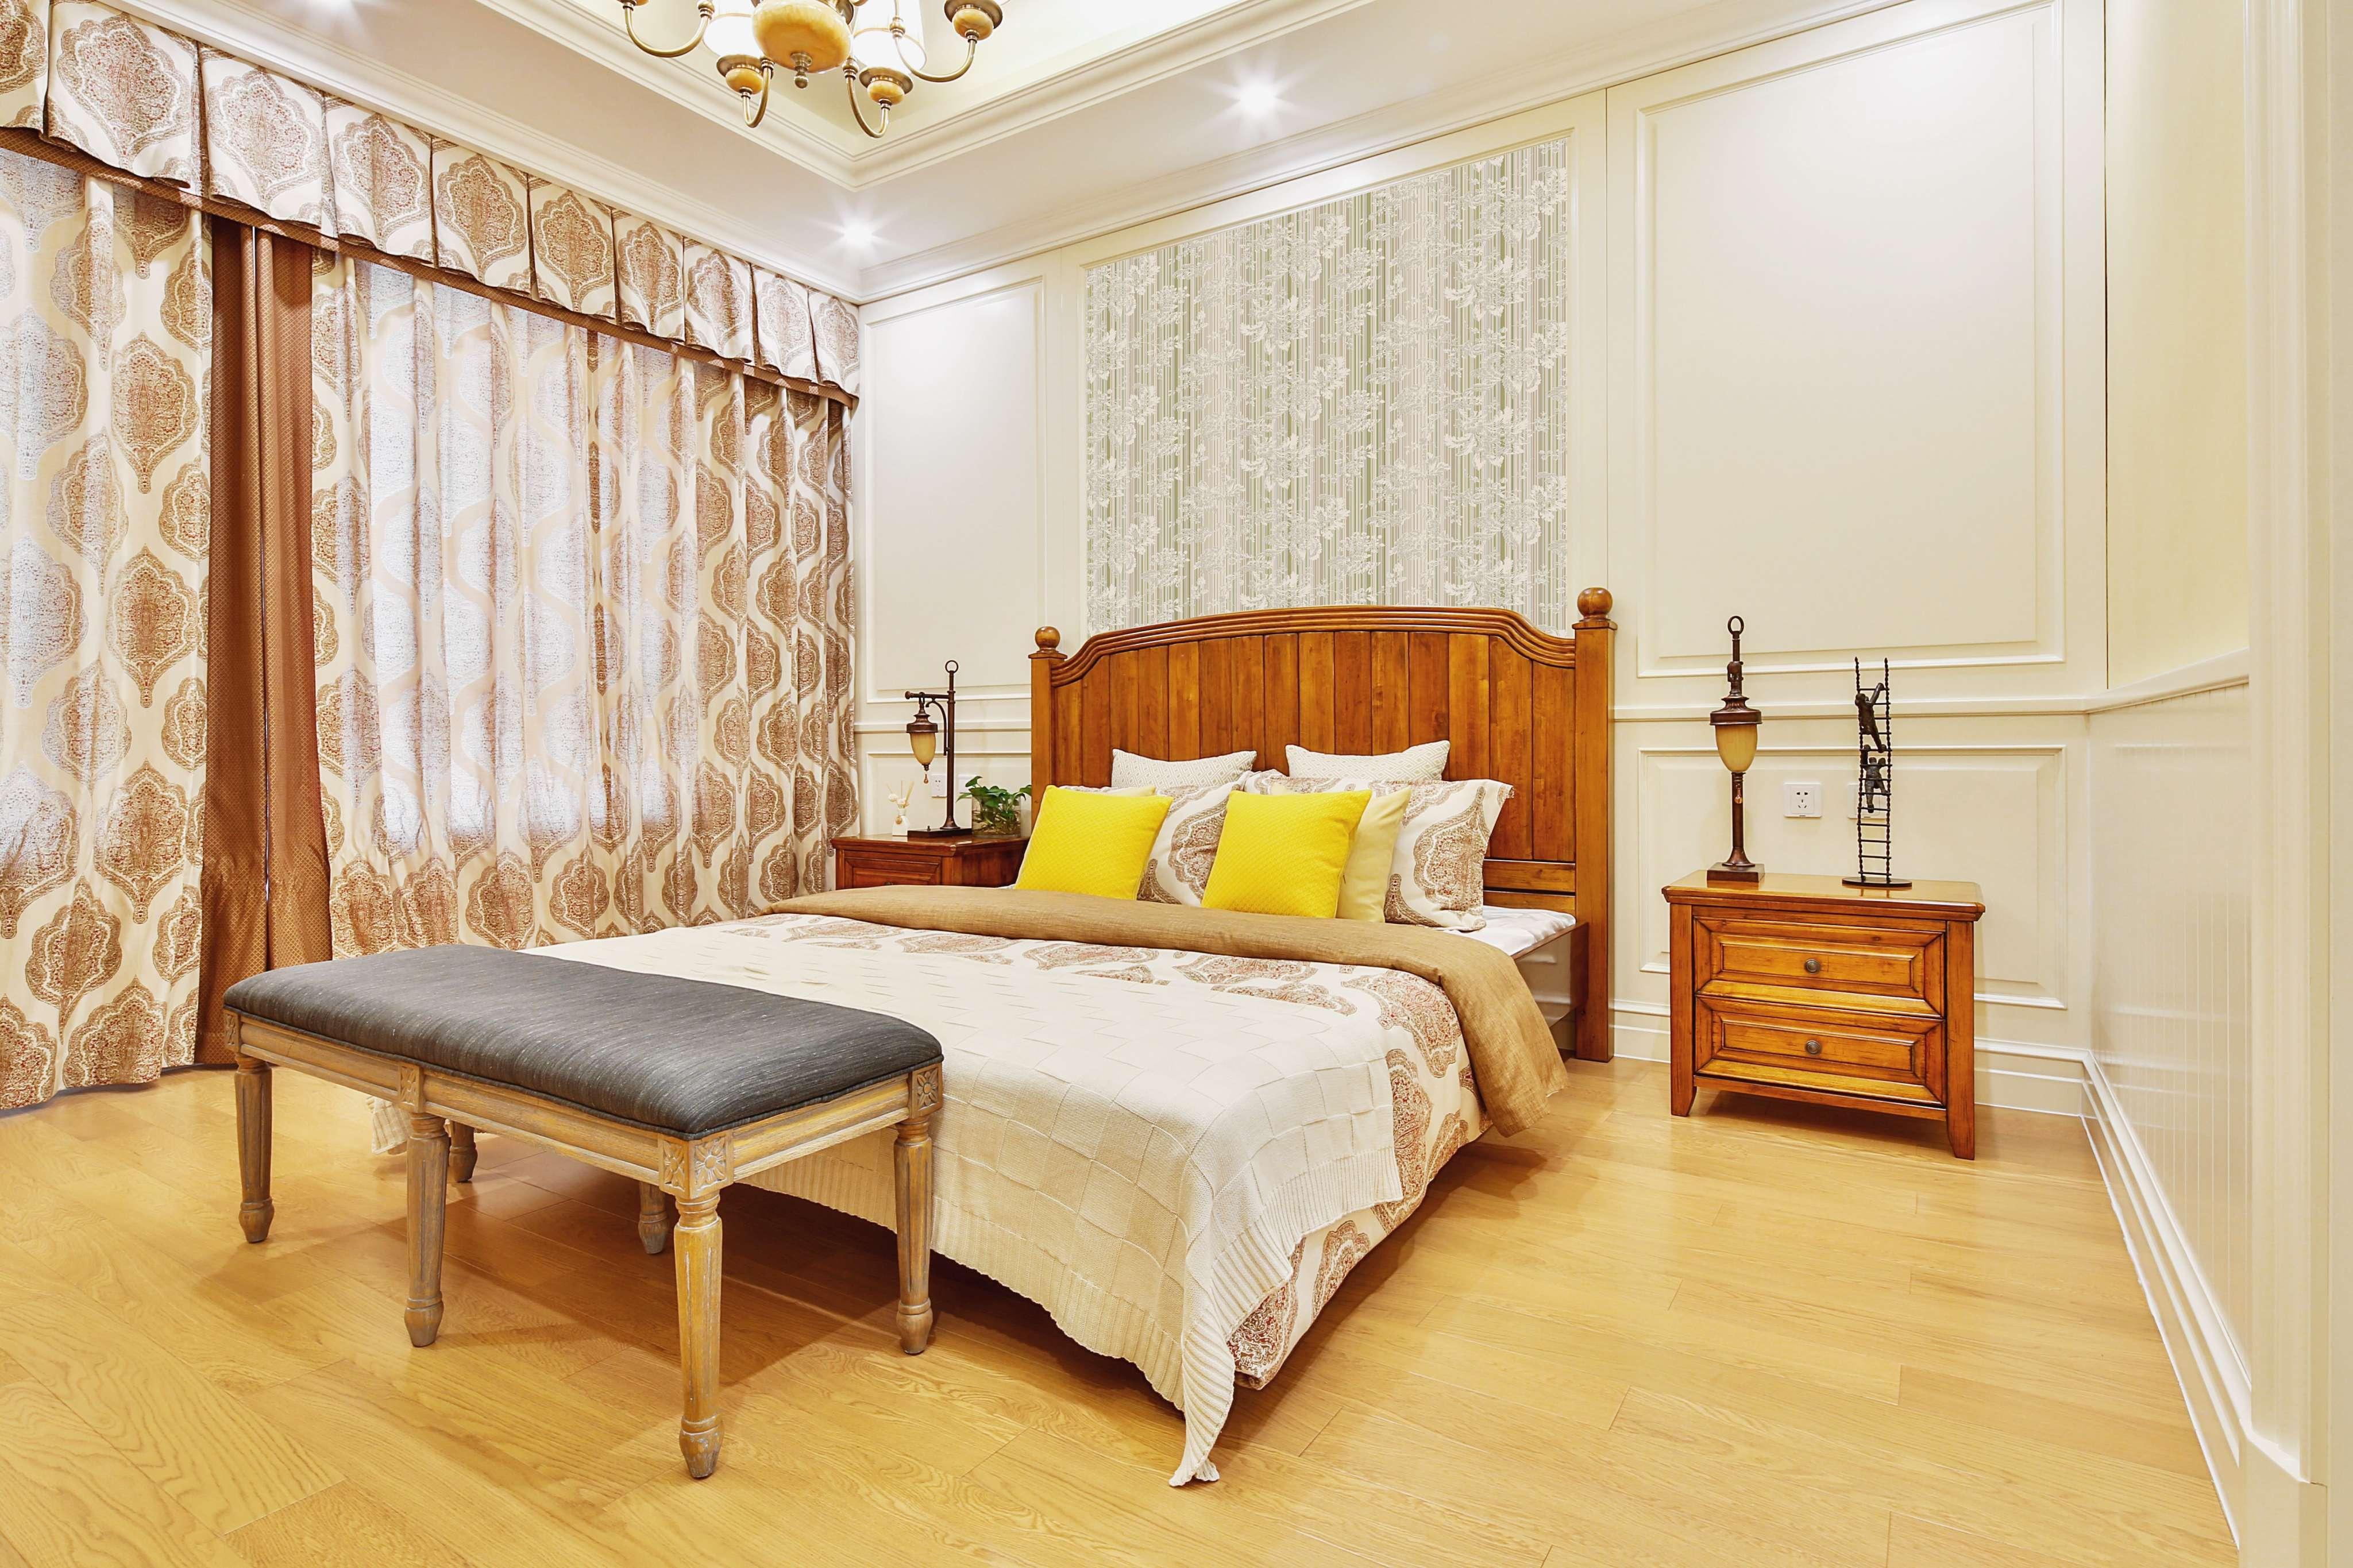 FABENI卧室床头背景墙护墙板 可定制